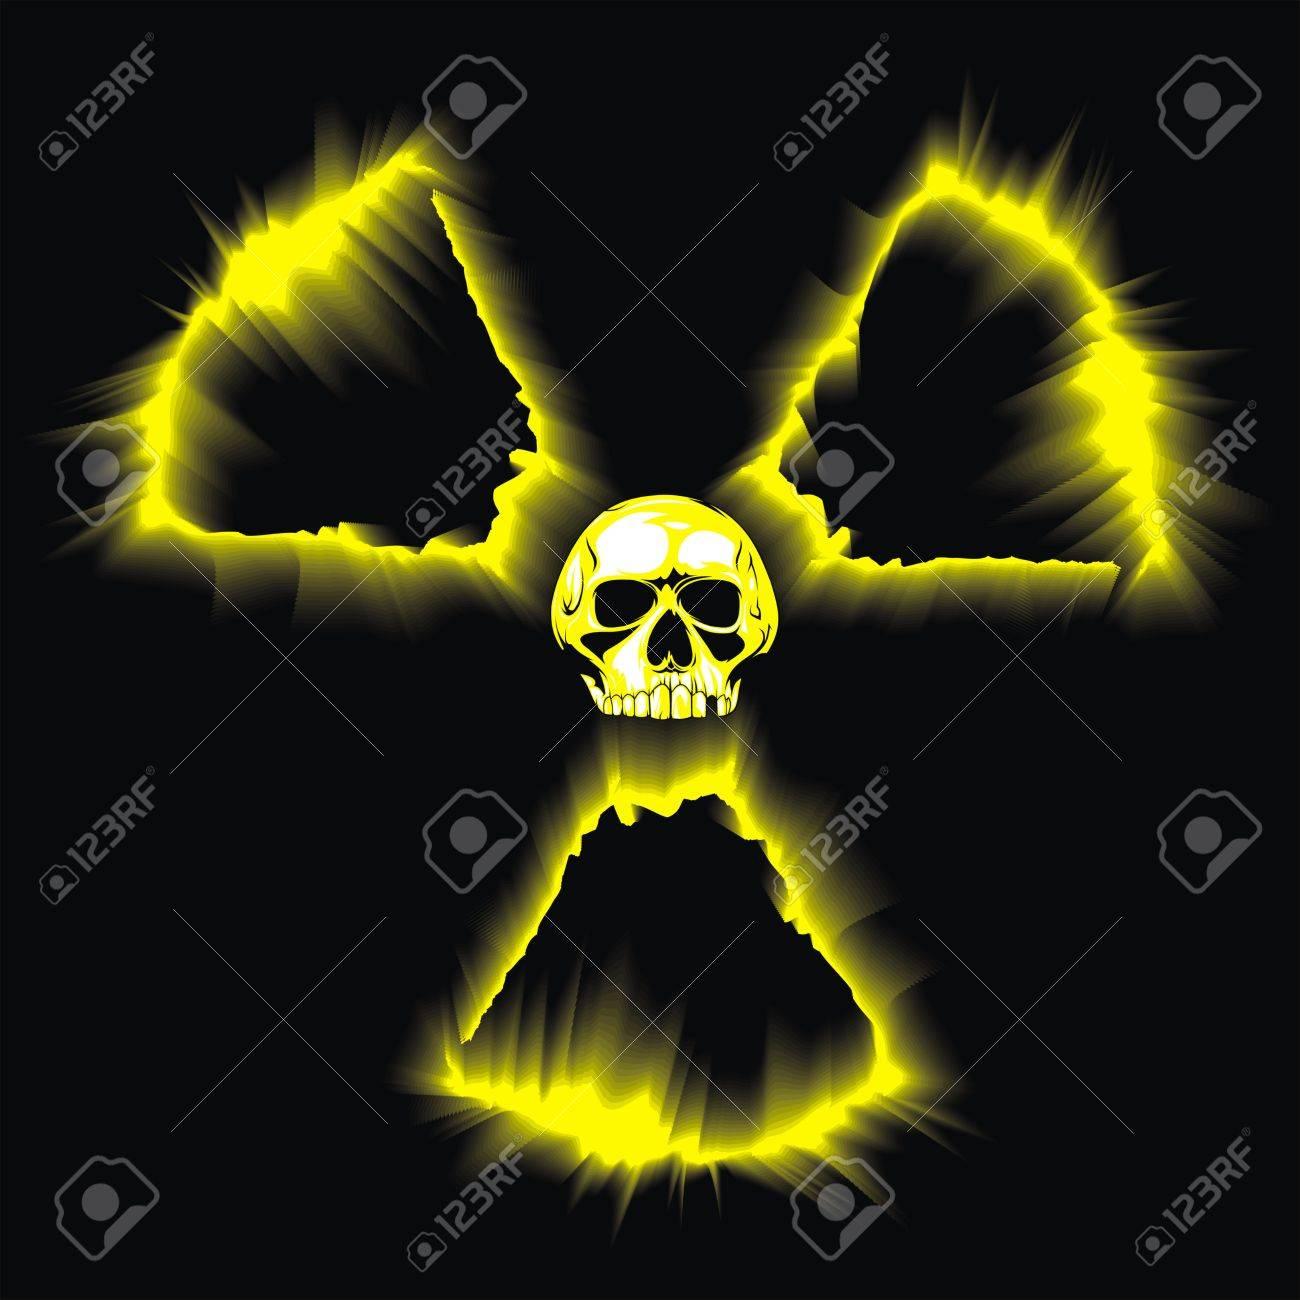 Danger radioactive symbol as very nice illustration royalty free danger radioactive symbol as very nice illustration stock vector 52542579 buycottarizona